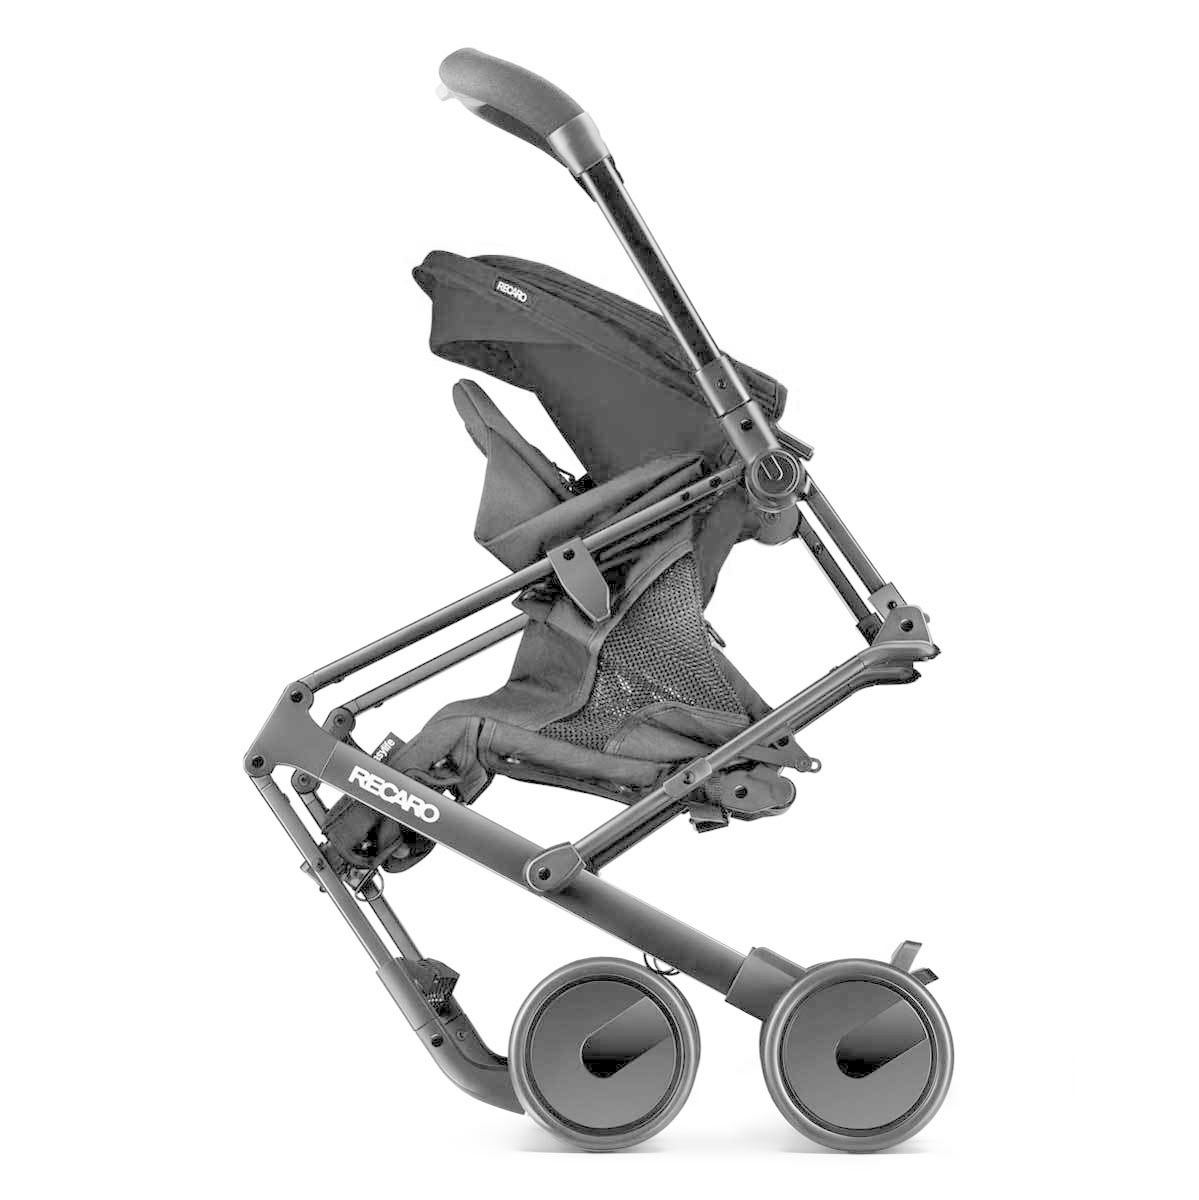 Recaro Recaro Easylife Elite buggy Black